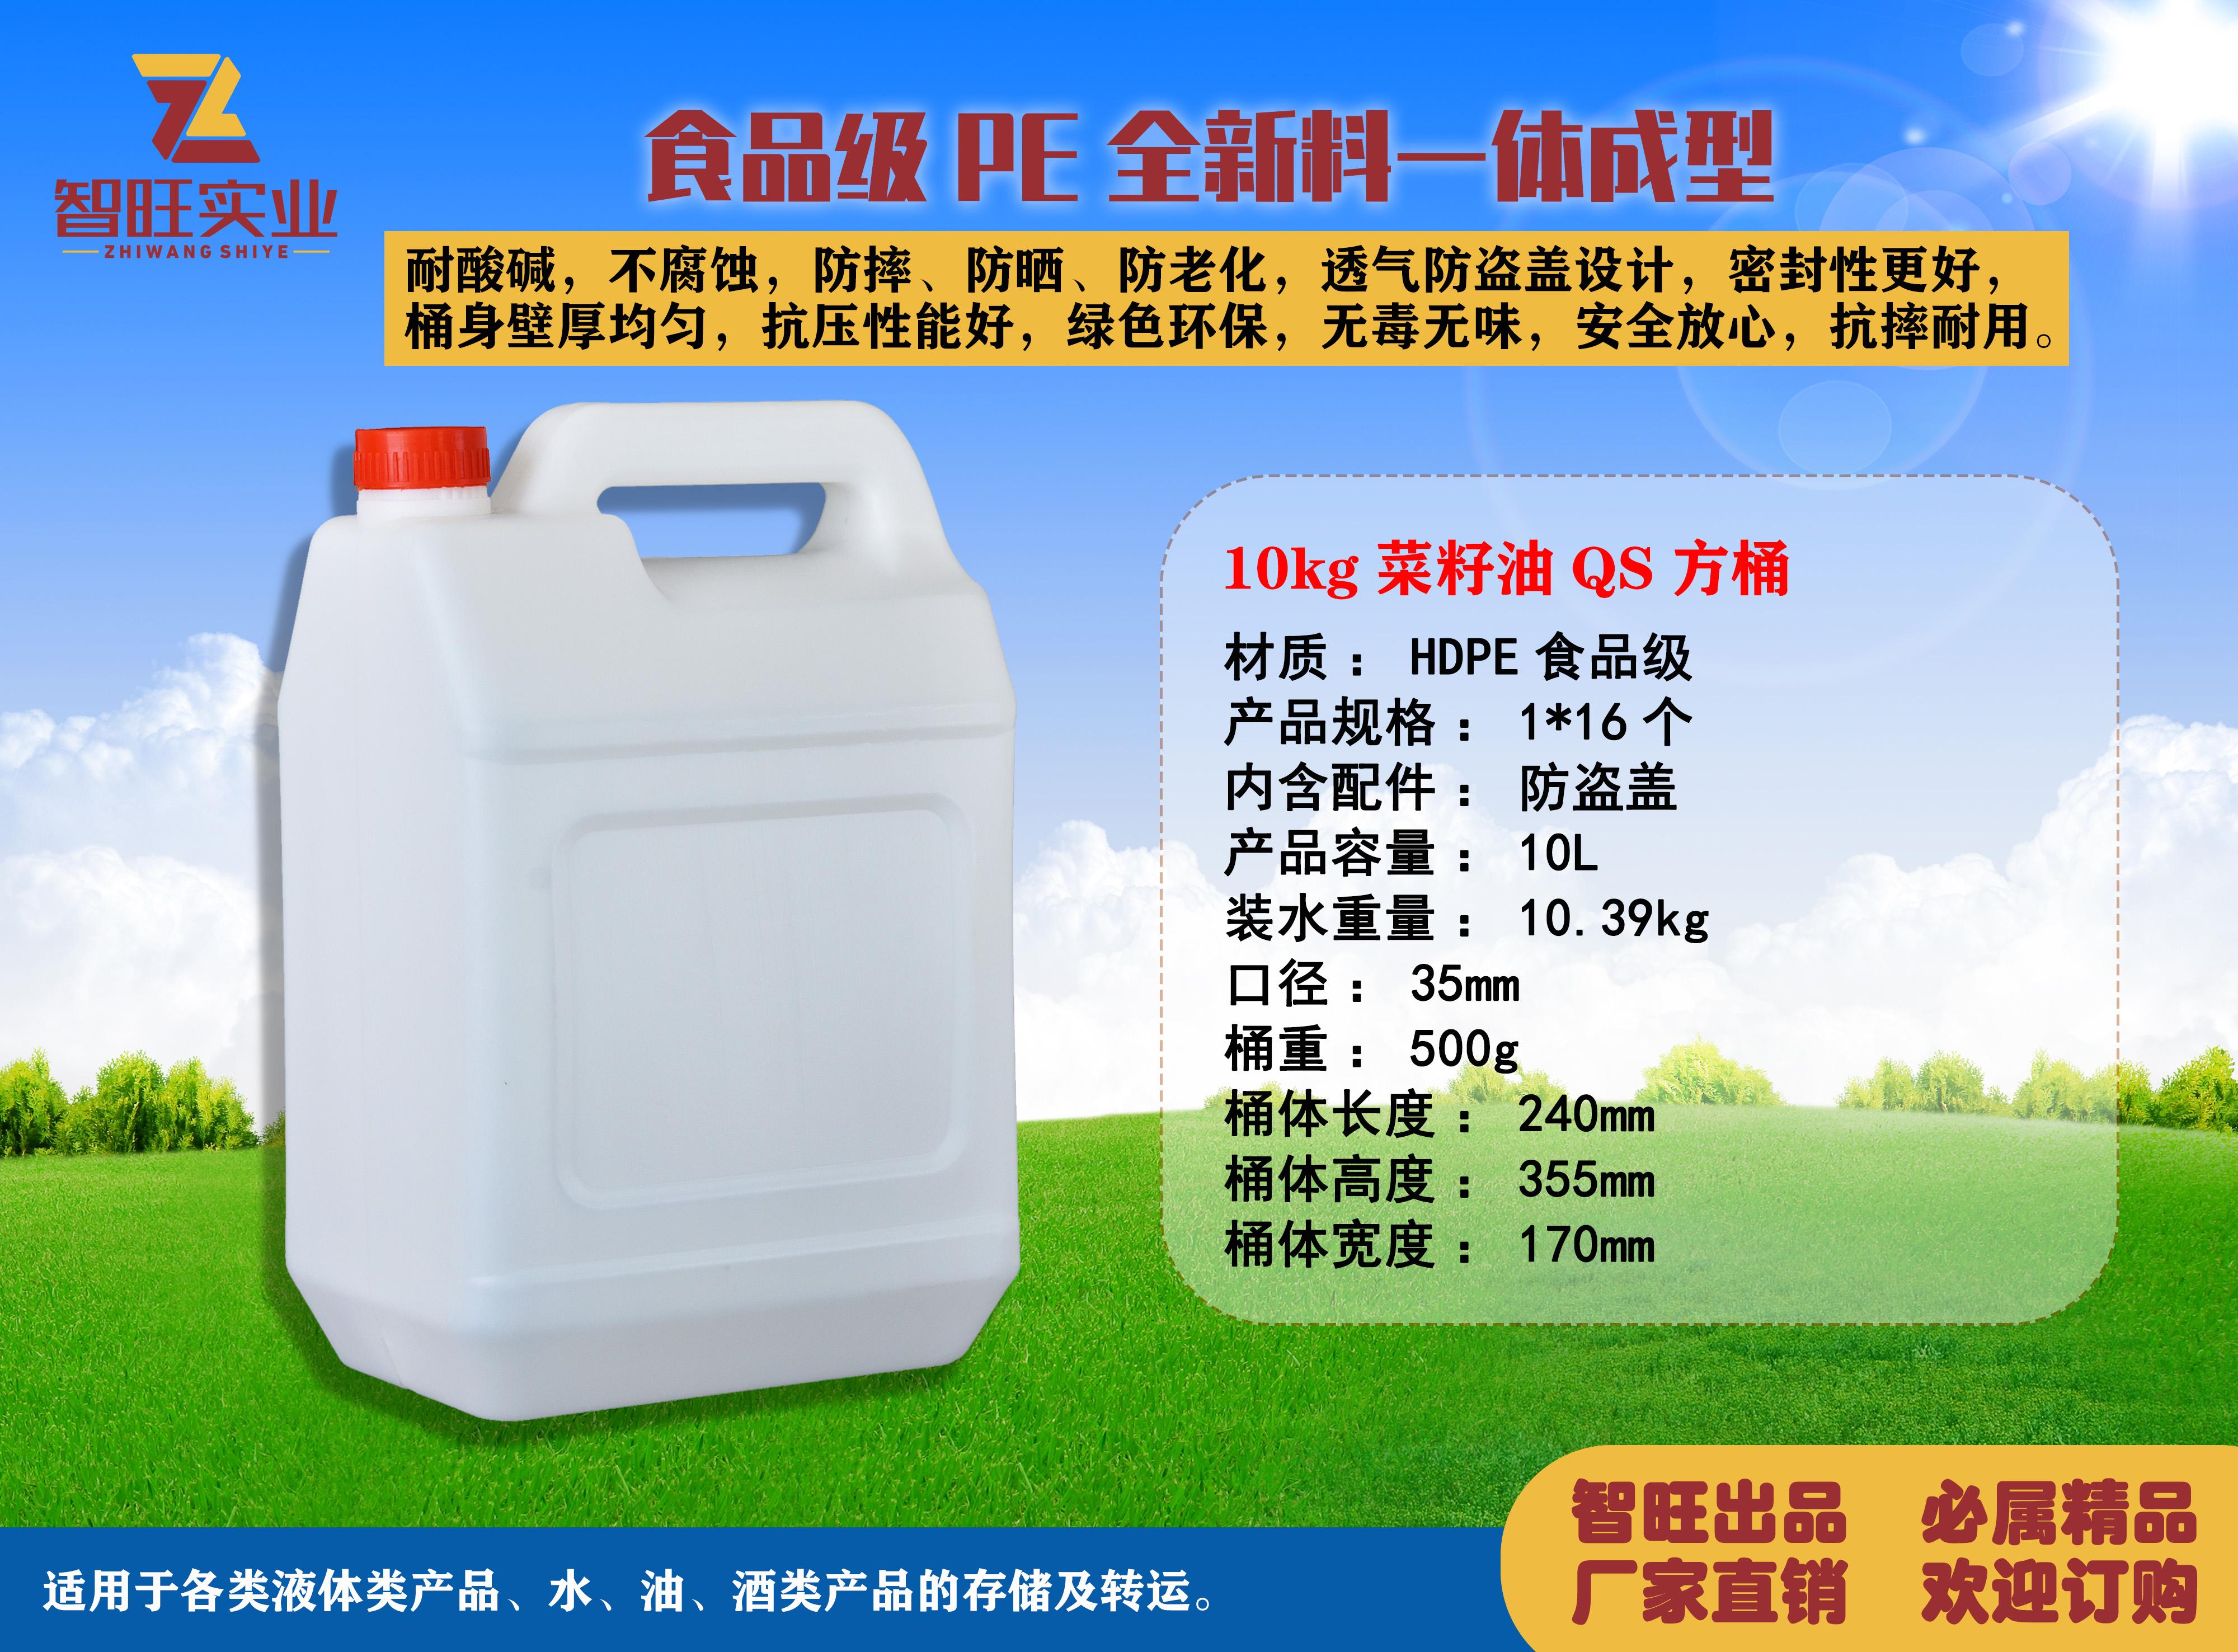 10kg菜籽油QS方桶